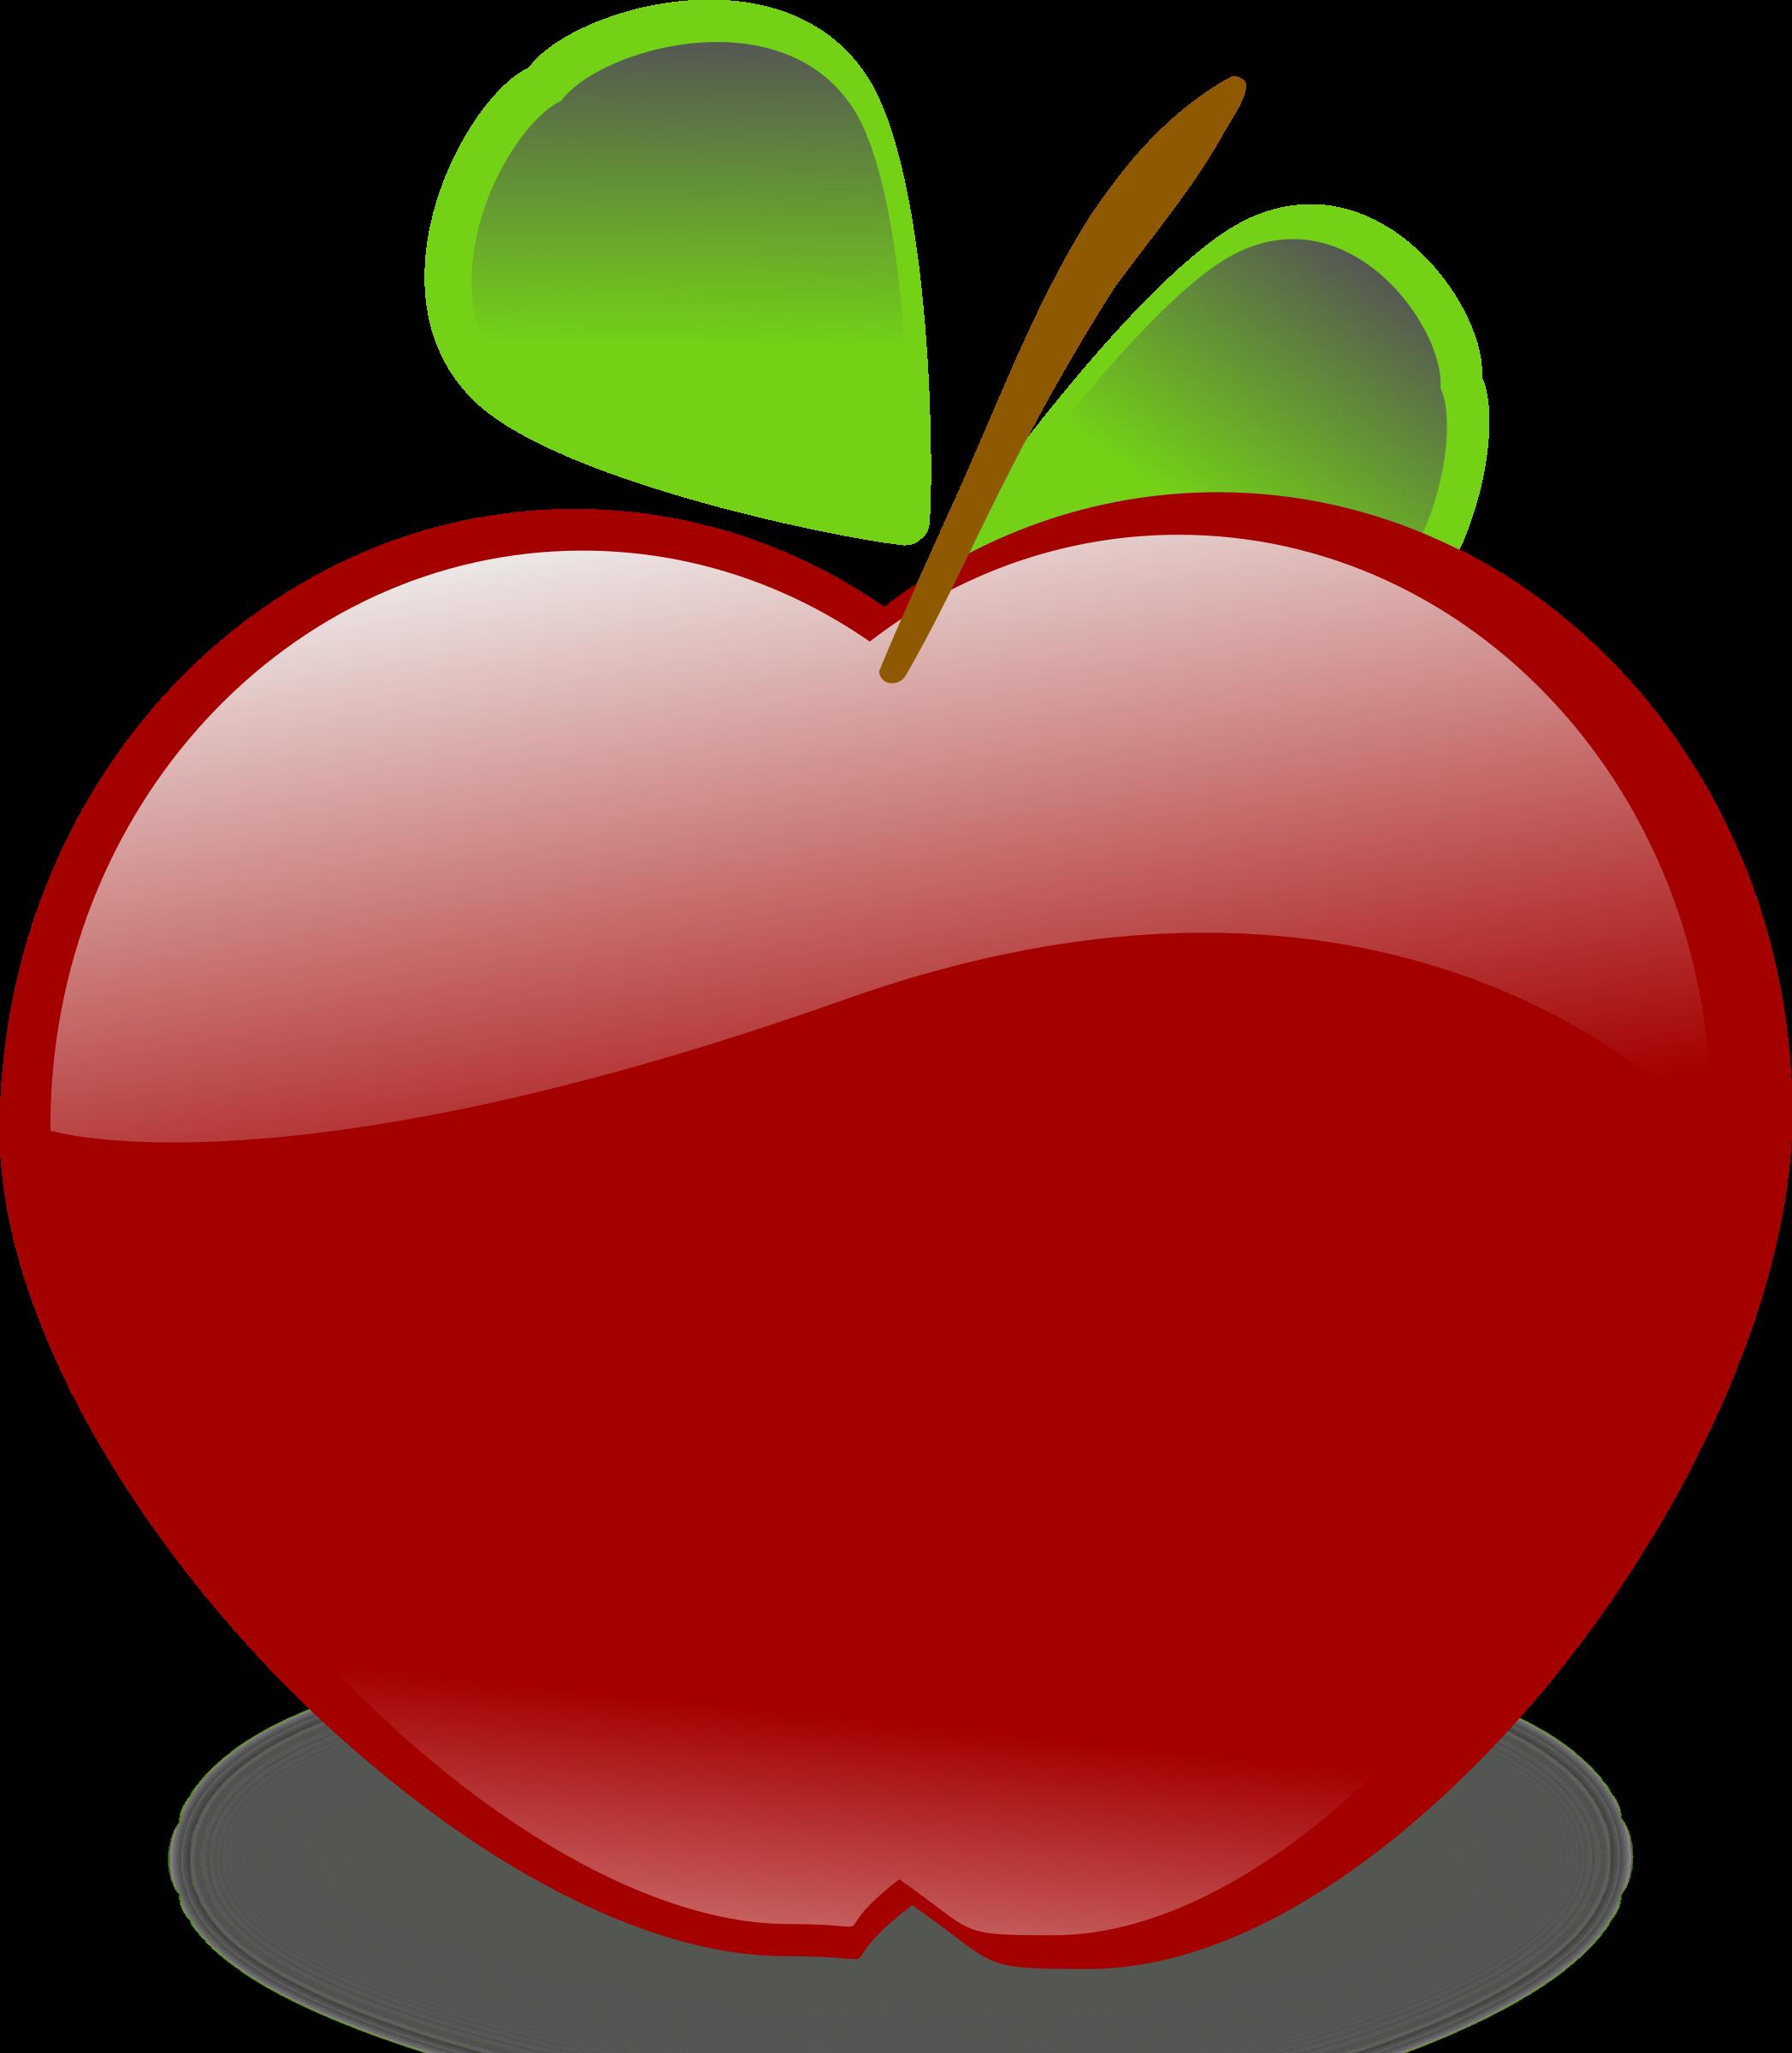 Big image png. Clipart apple cartoon